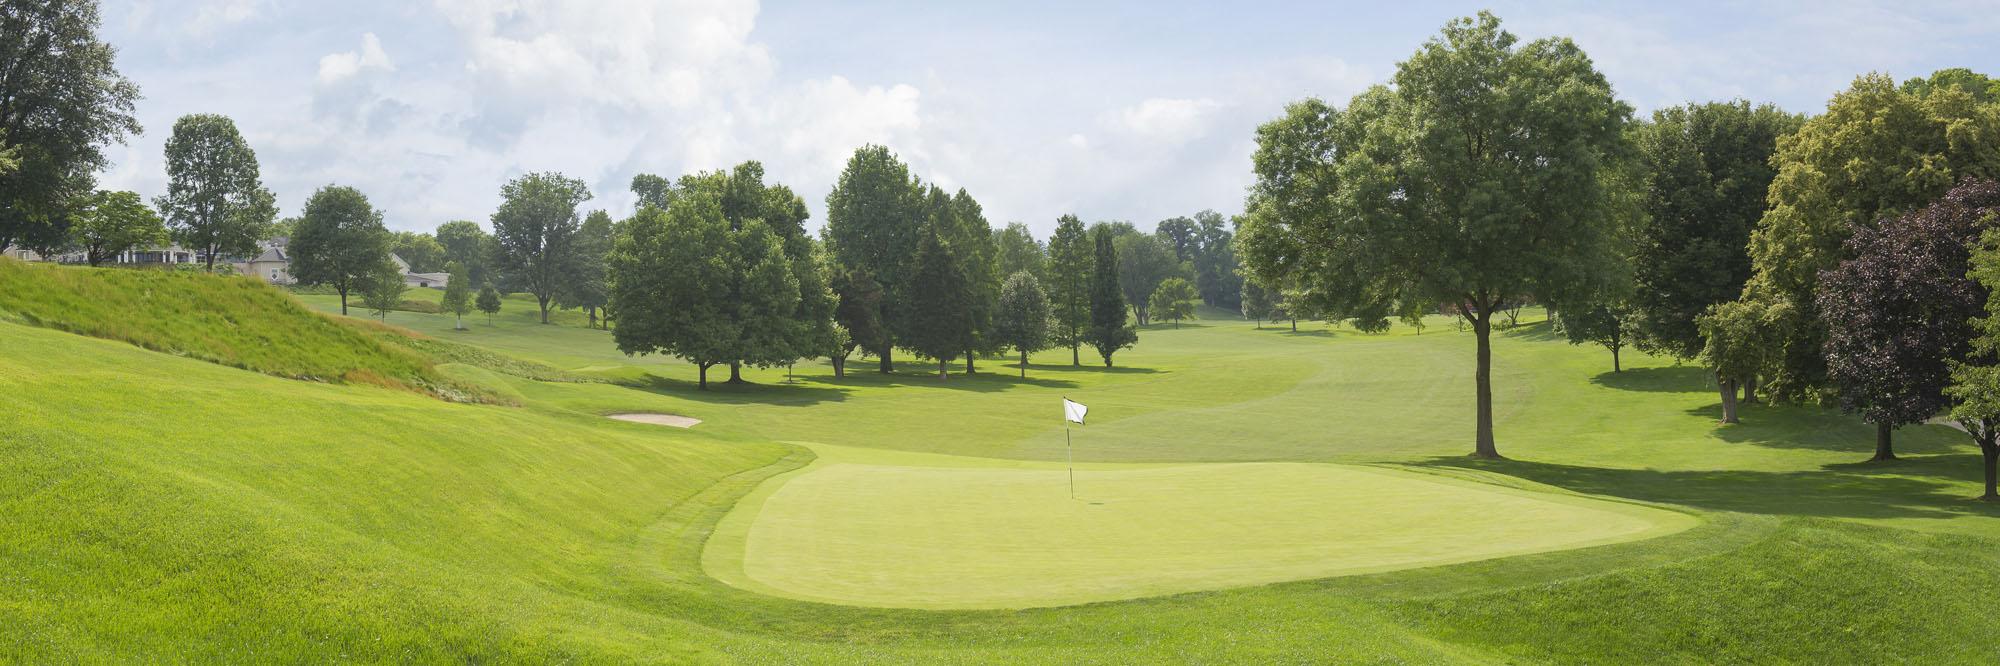 Golf Course Image - Berkshire No. 4